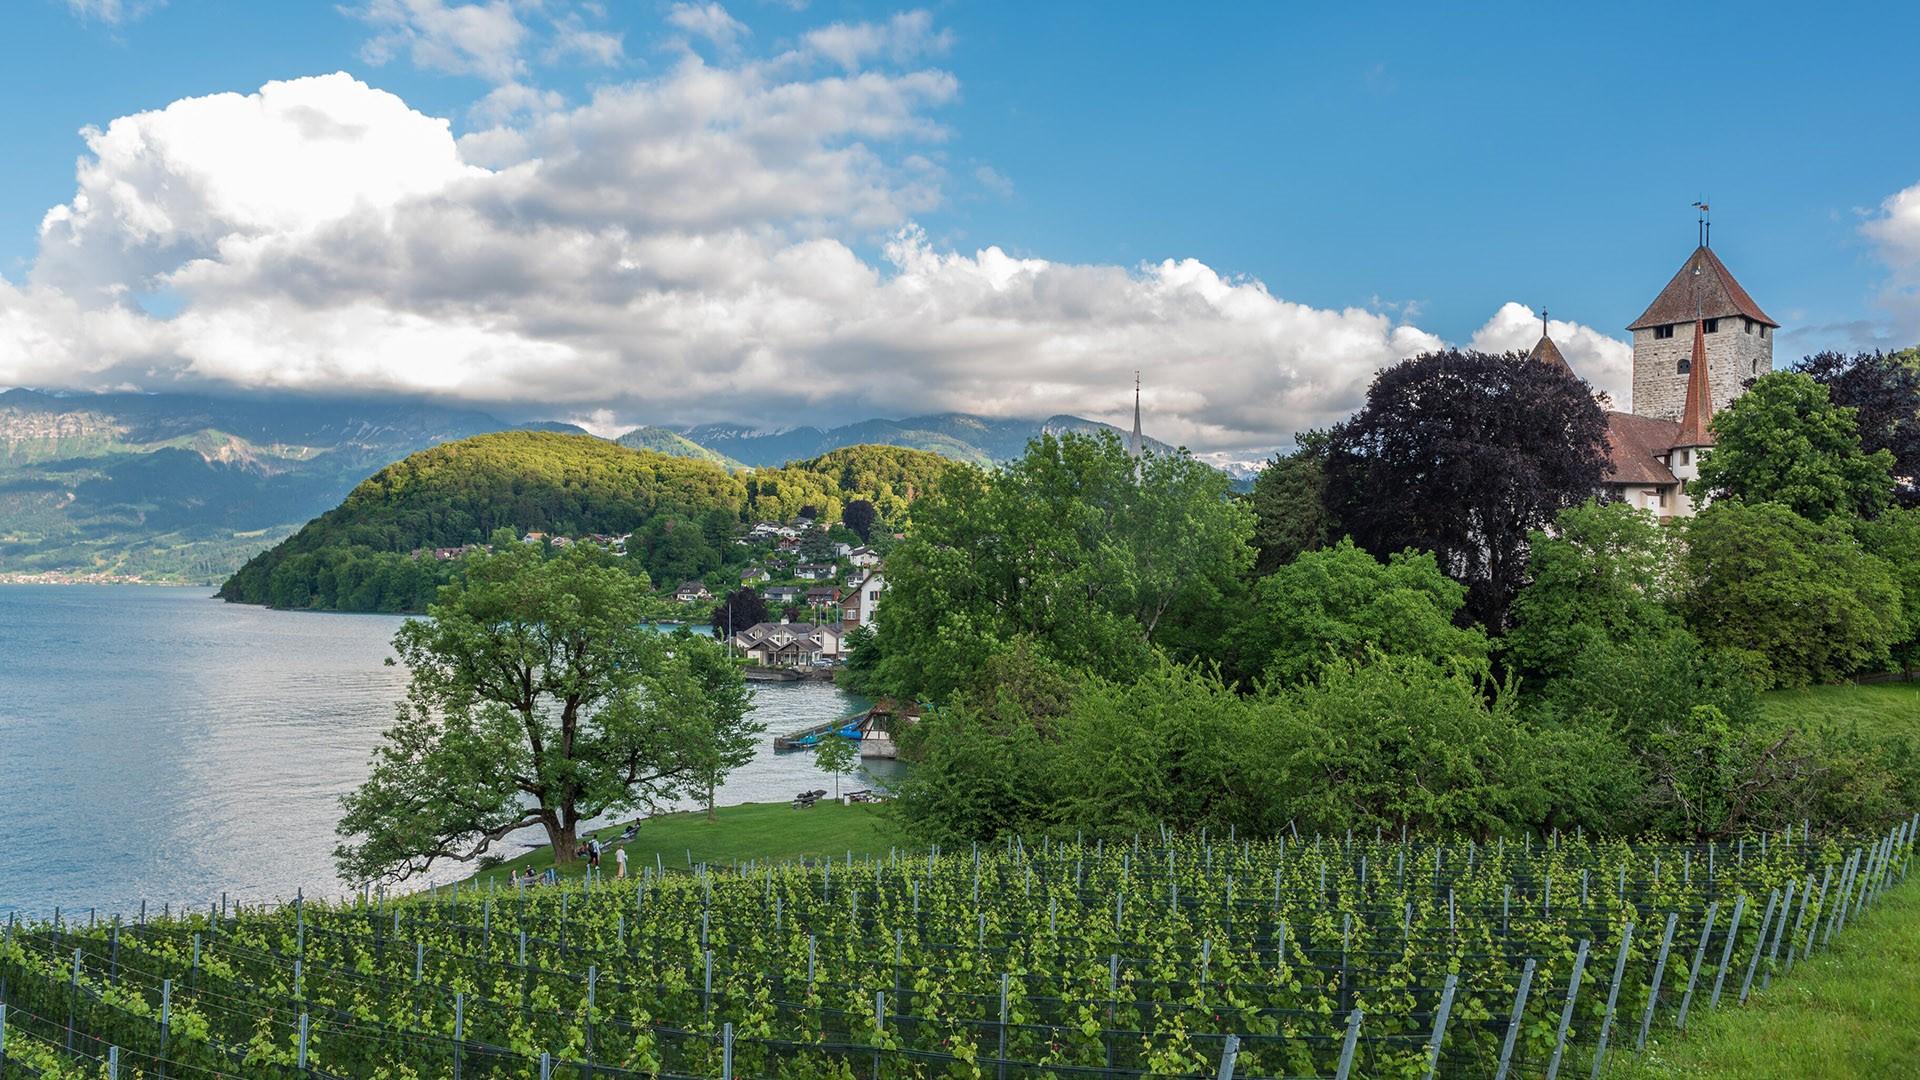 General 1920x1080 landscape water nature village vineyard mountains